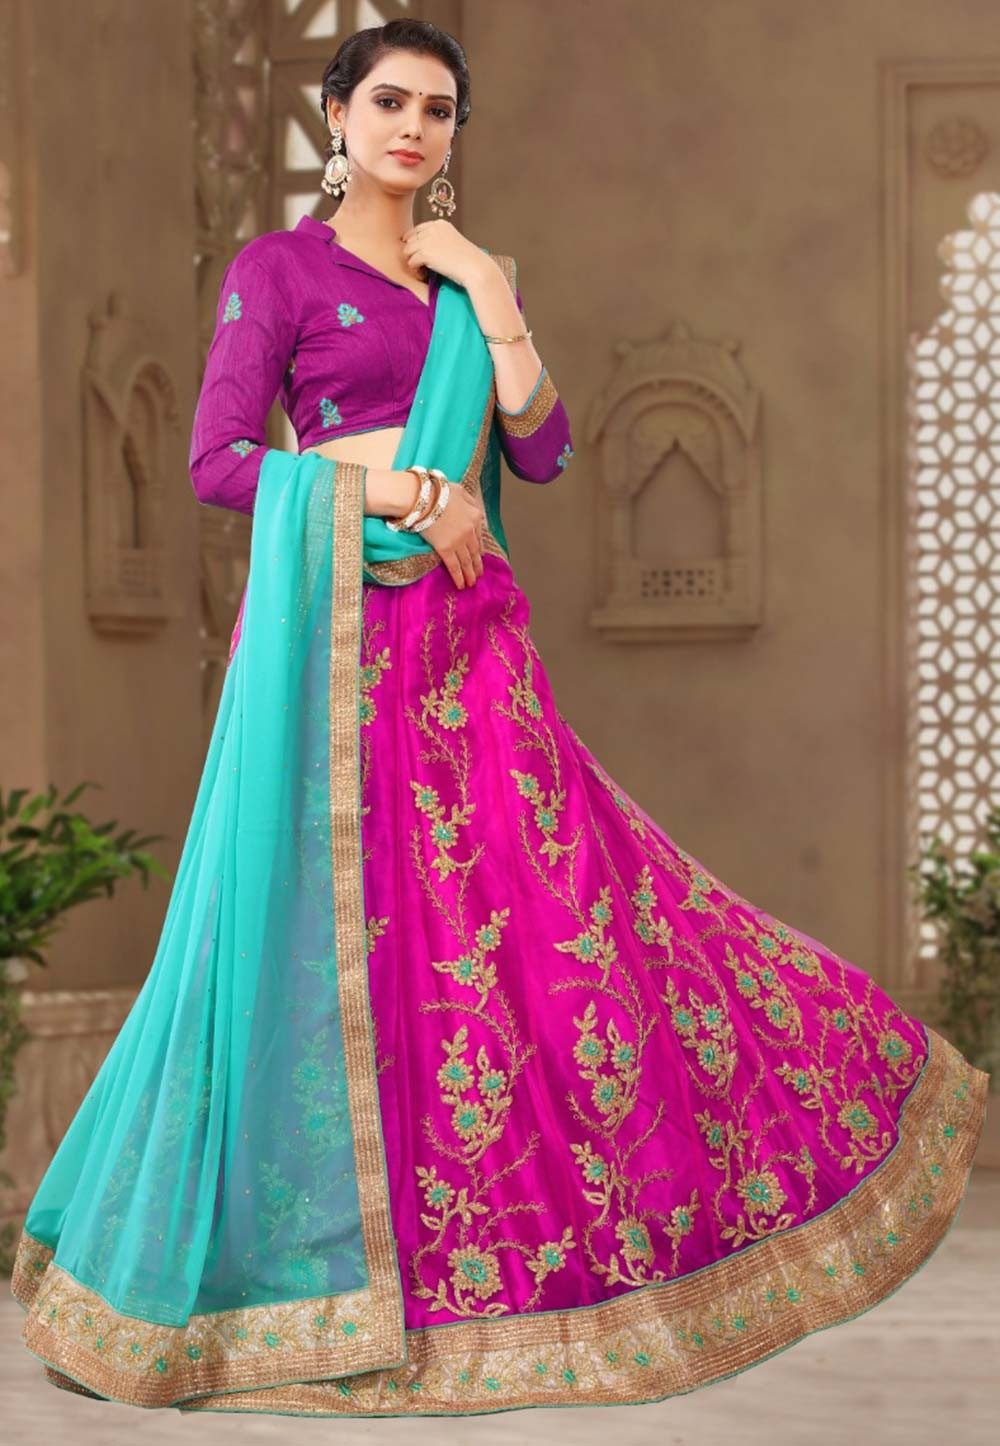 Magenta Colour Lehenga choli for bridesmaid